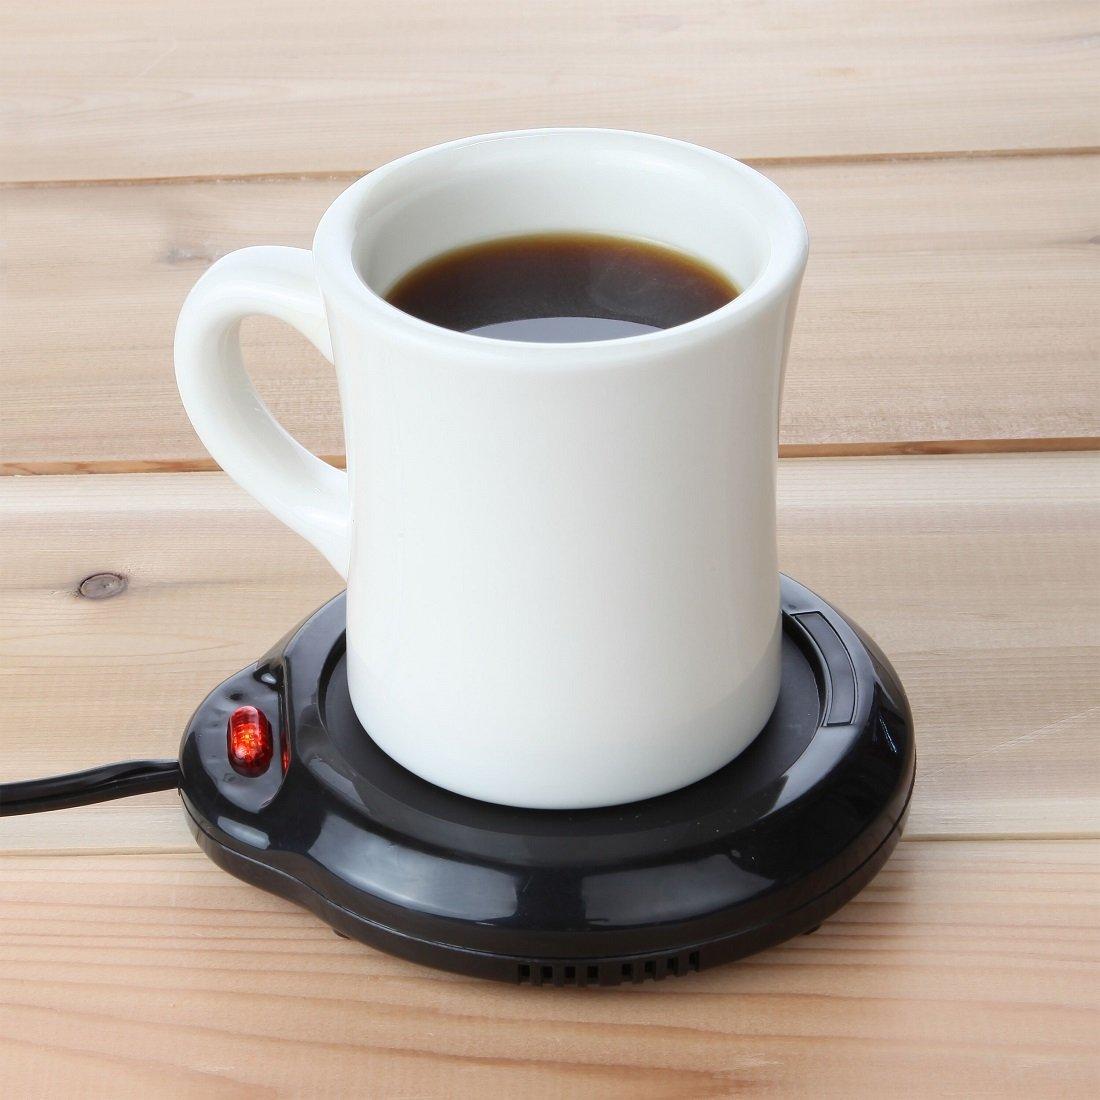 mug warmer secret santa gift ideas